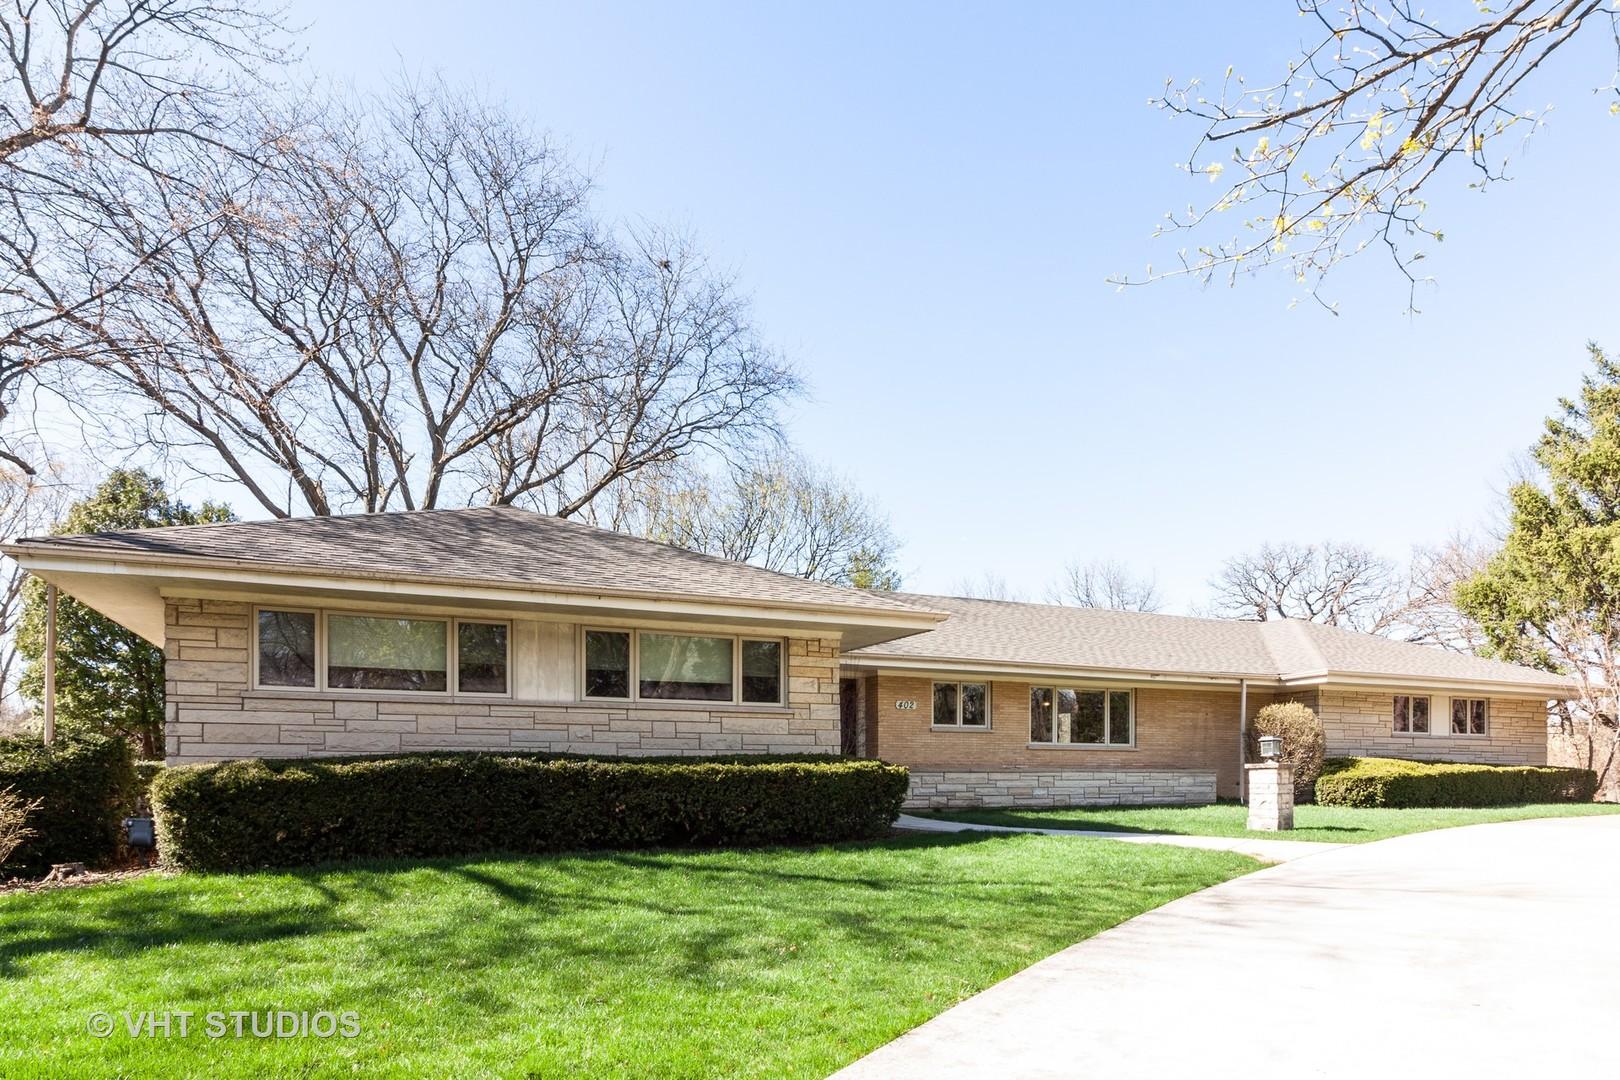 402 Warren Terrace Hinsdale, Illinois 60521